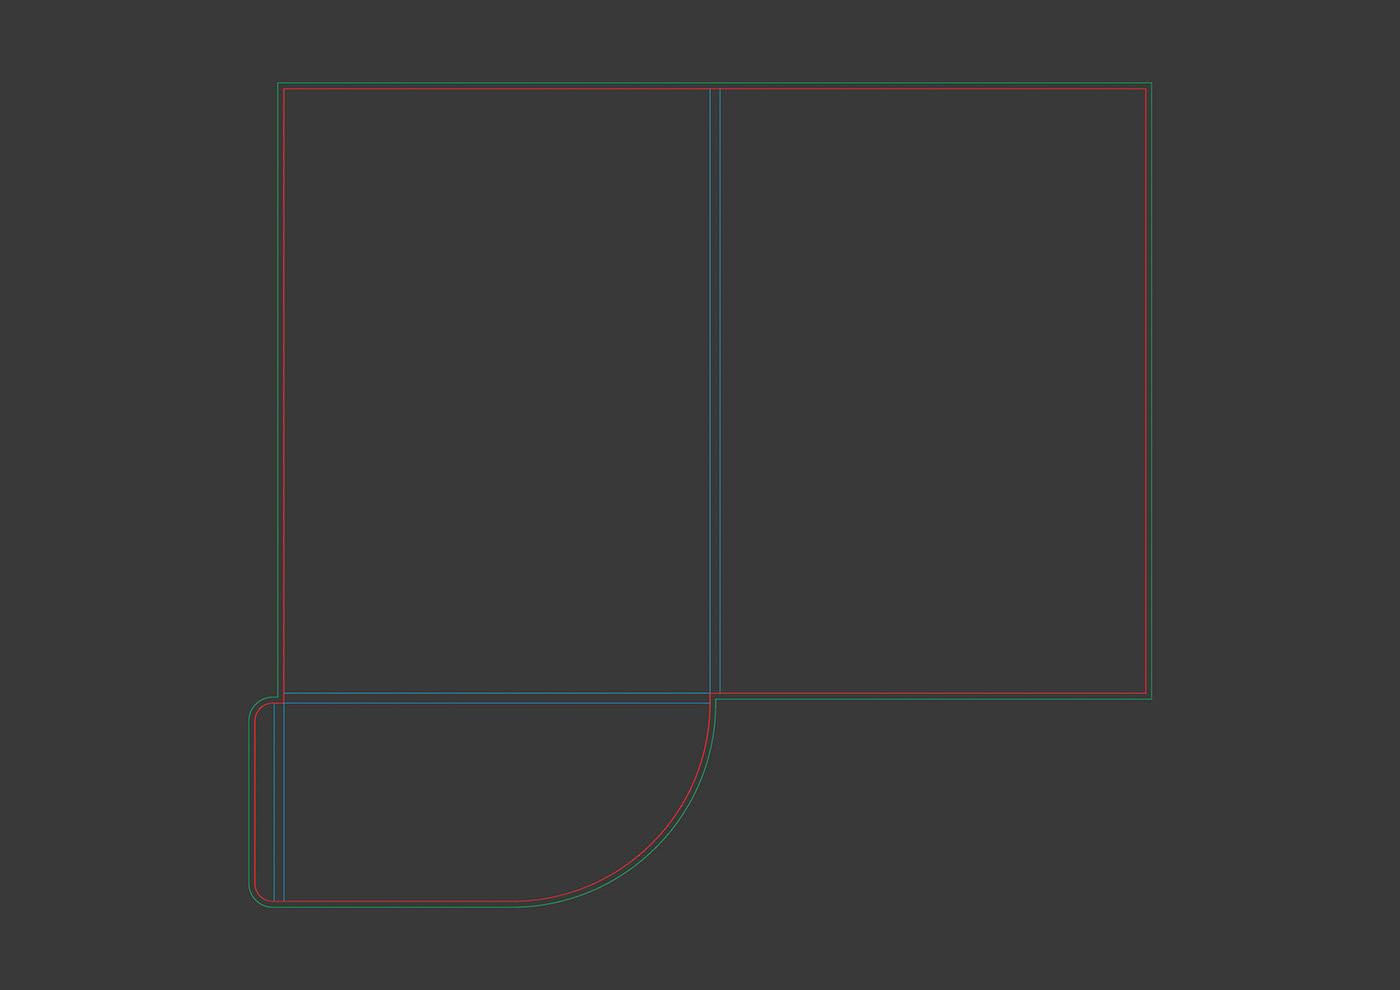 black brand identity branding  corporate branding editorial folder design graphic design  Logo Design Minimalism Office stationery